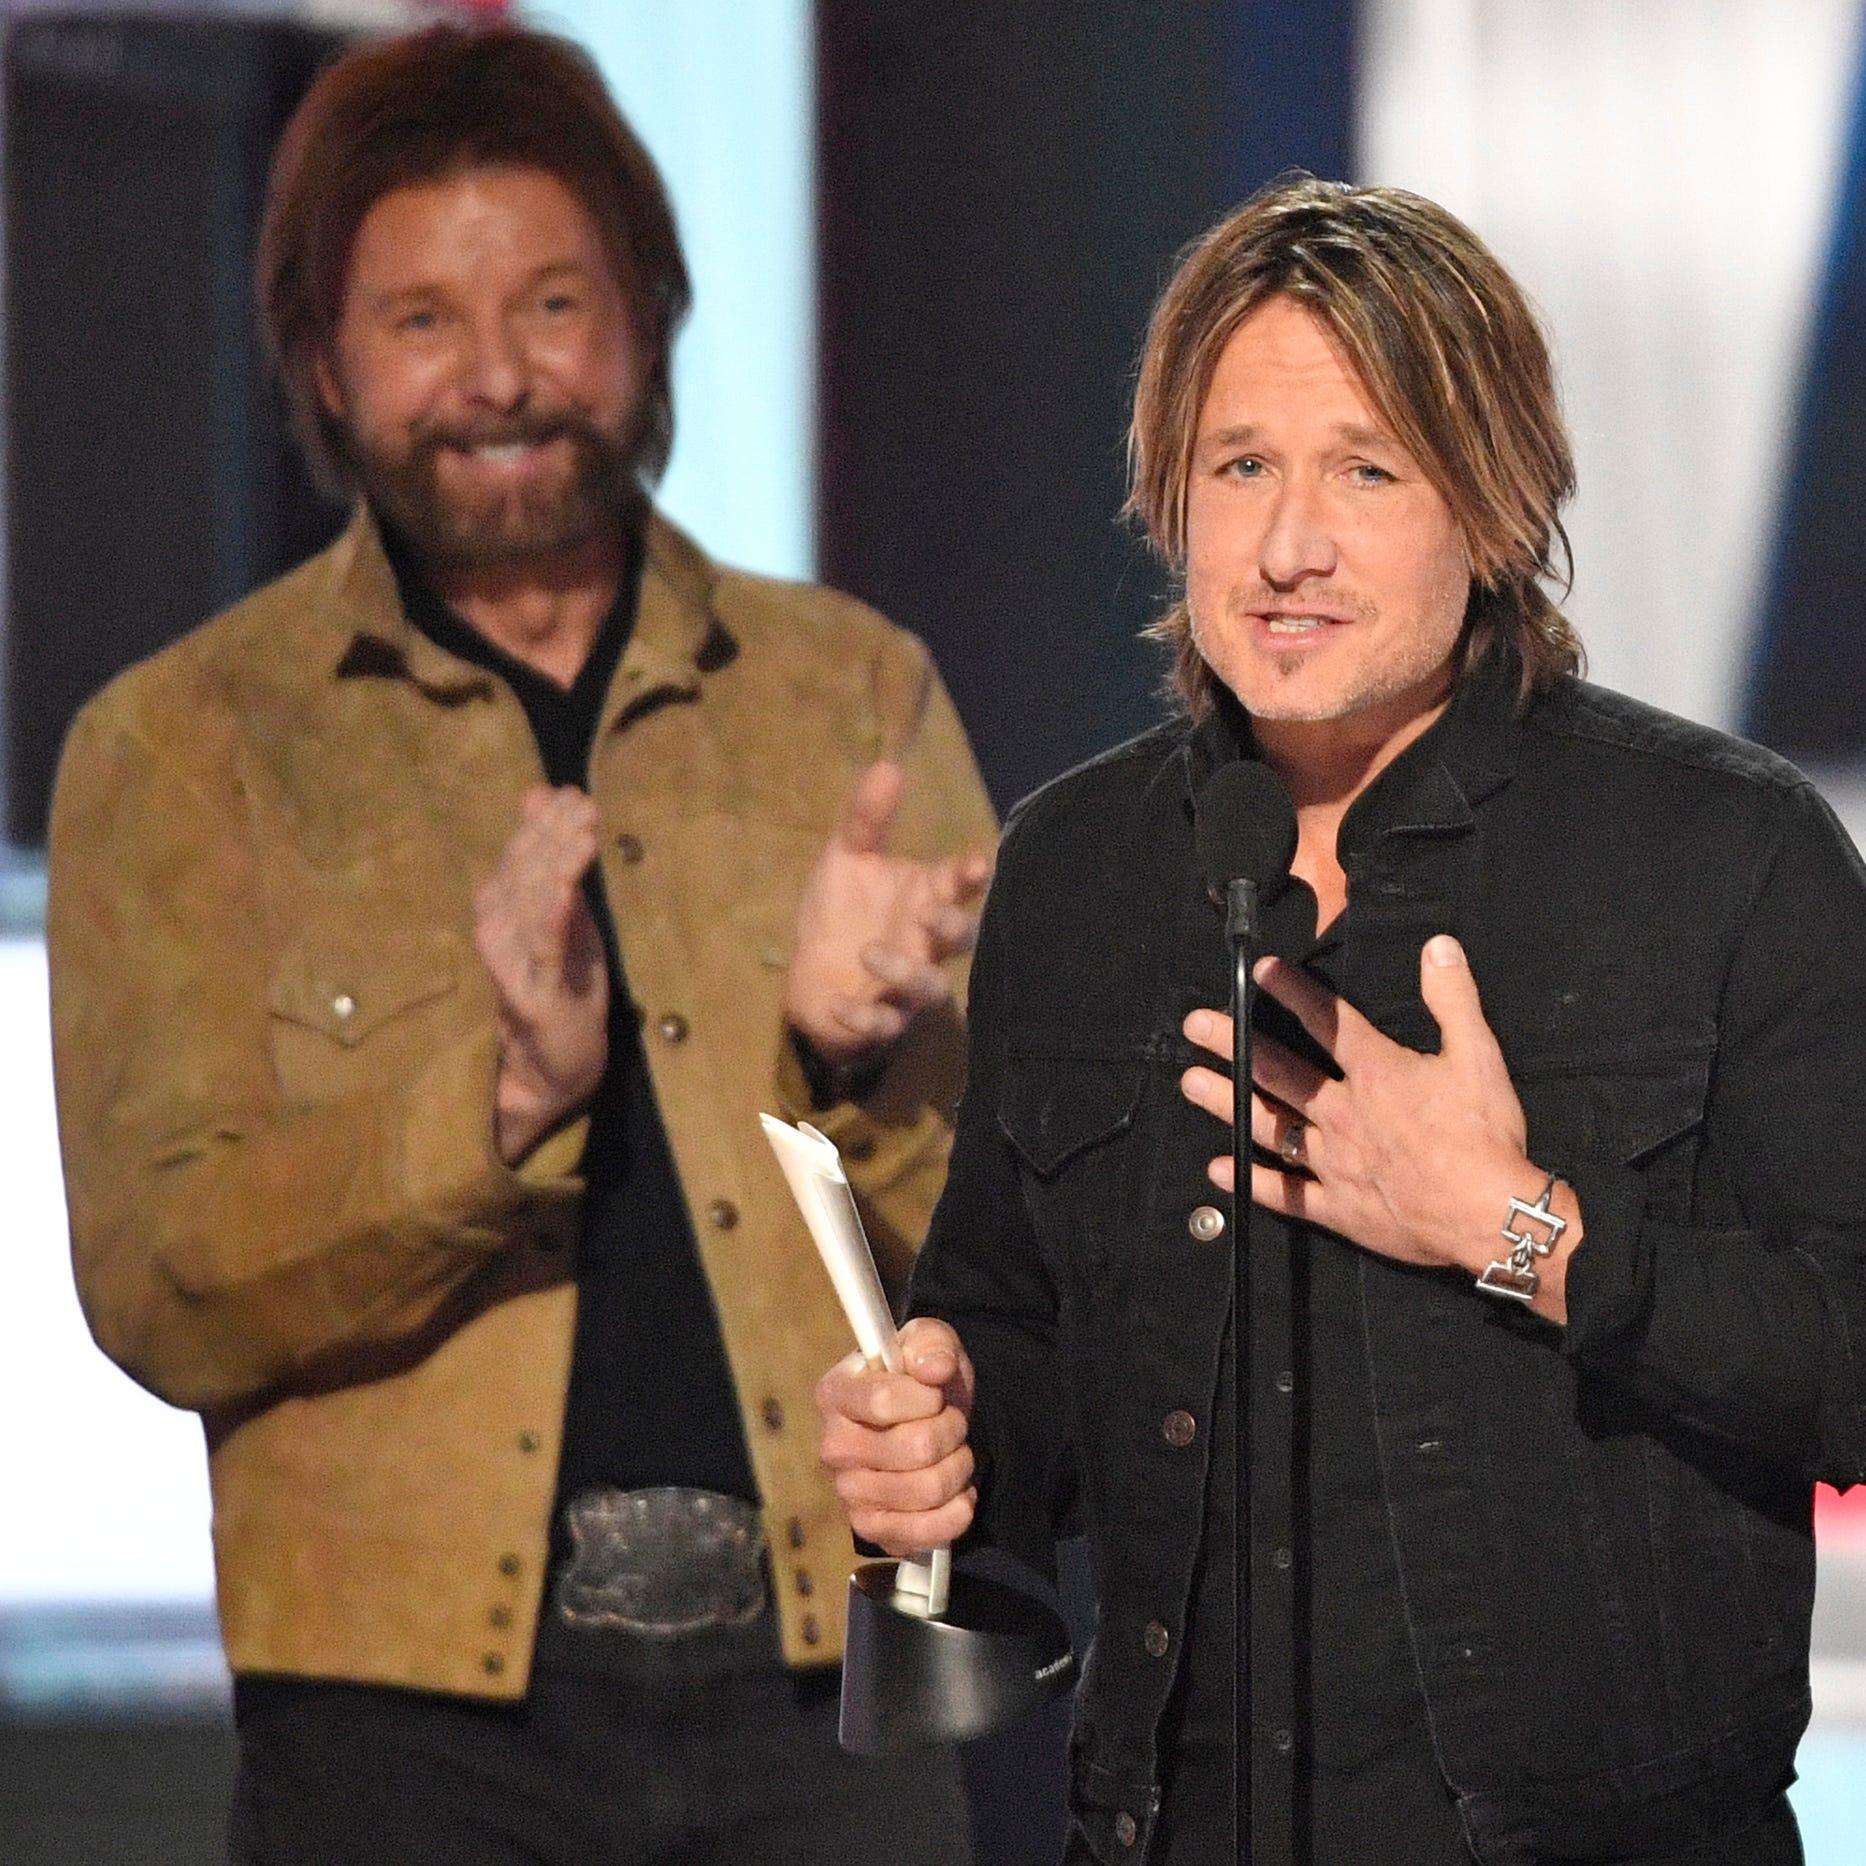 ACM Awards: Keith Urban, Dan + Shay reign